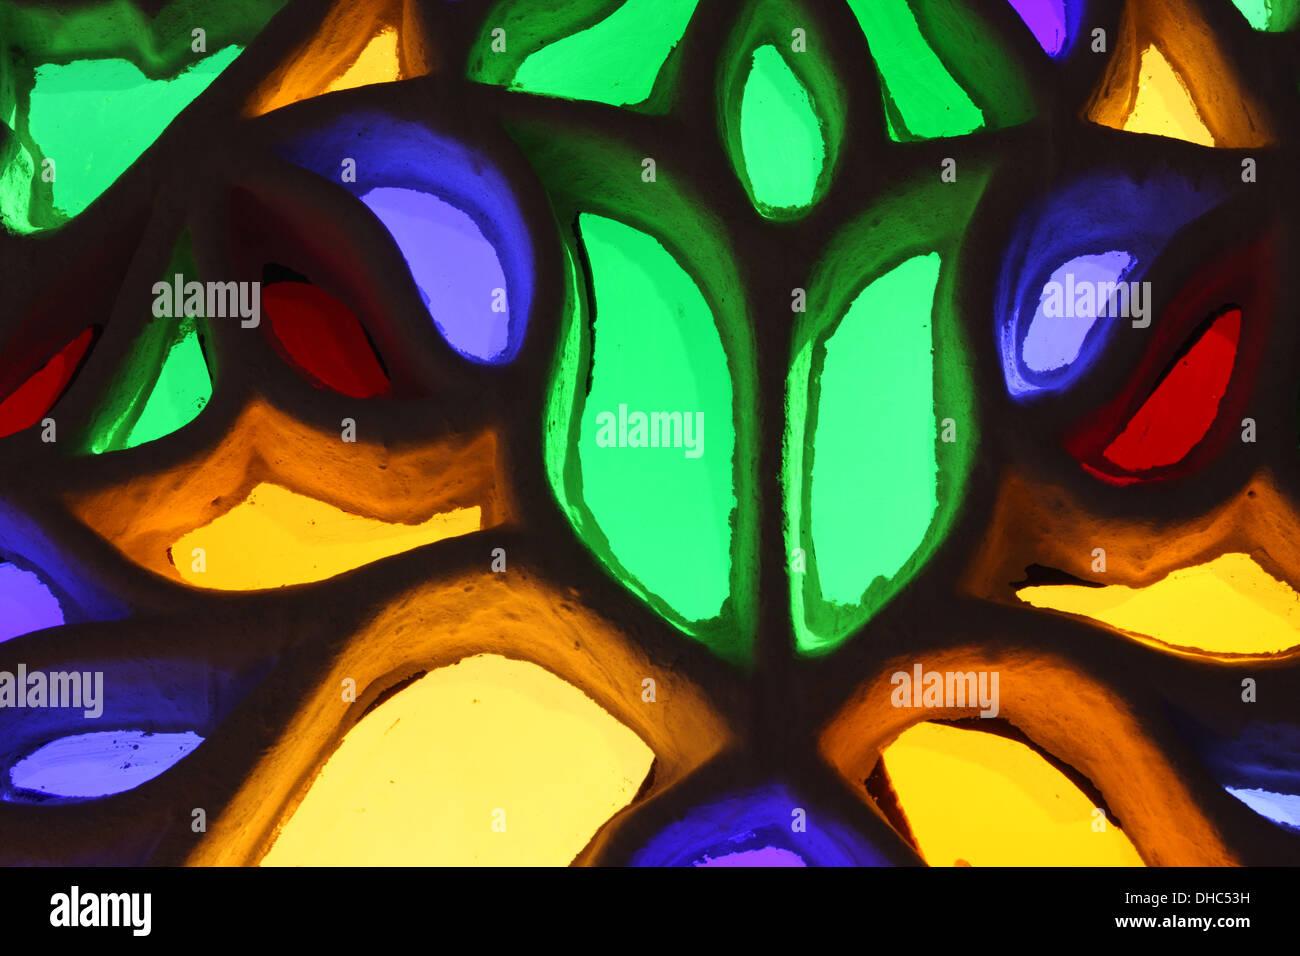 Stained glass window at the Rock Palace (Dar Al Hajar), near Wadi Dhar, Yemen - Stock Image